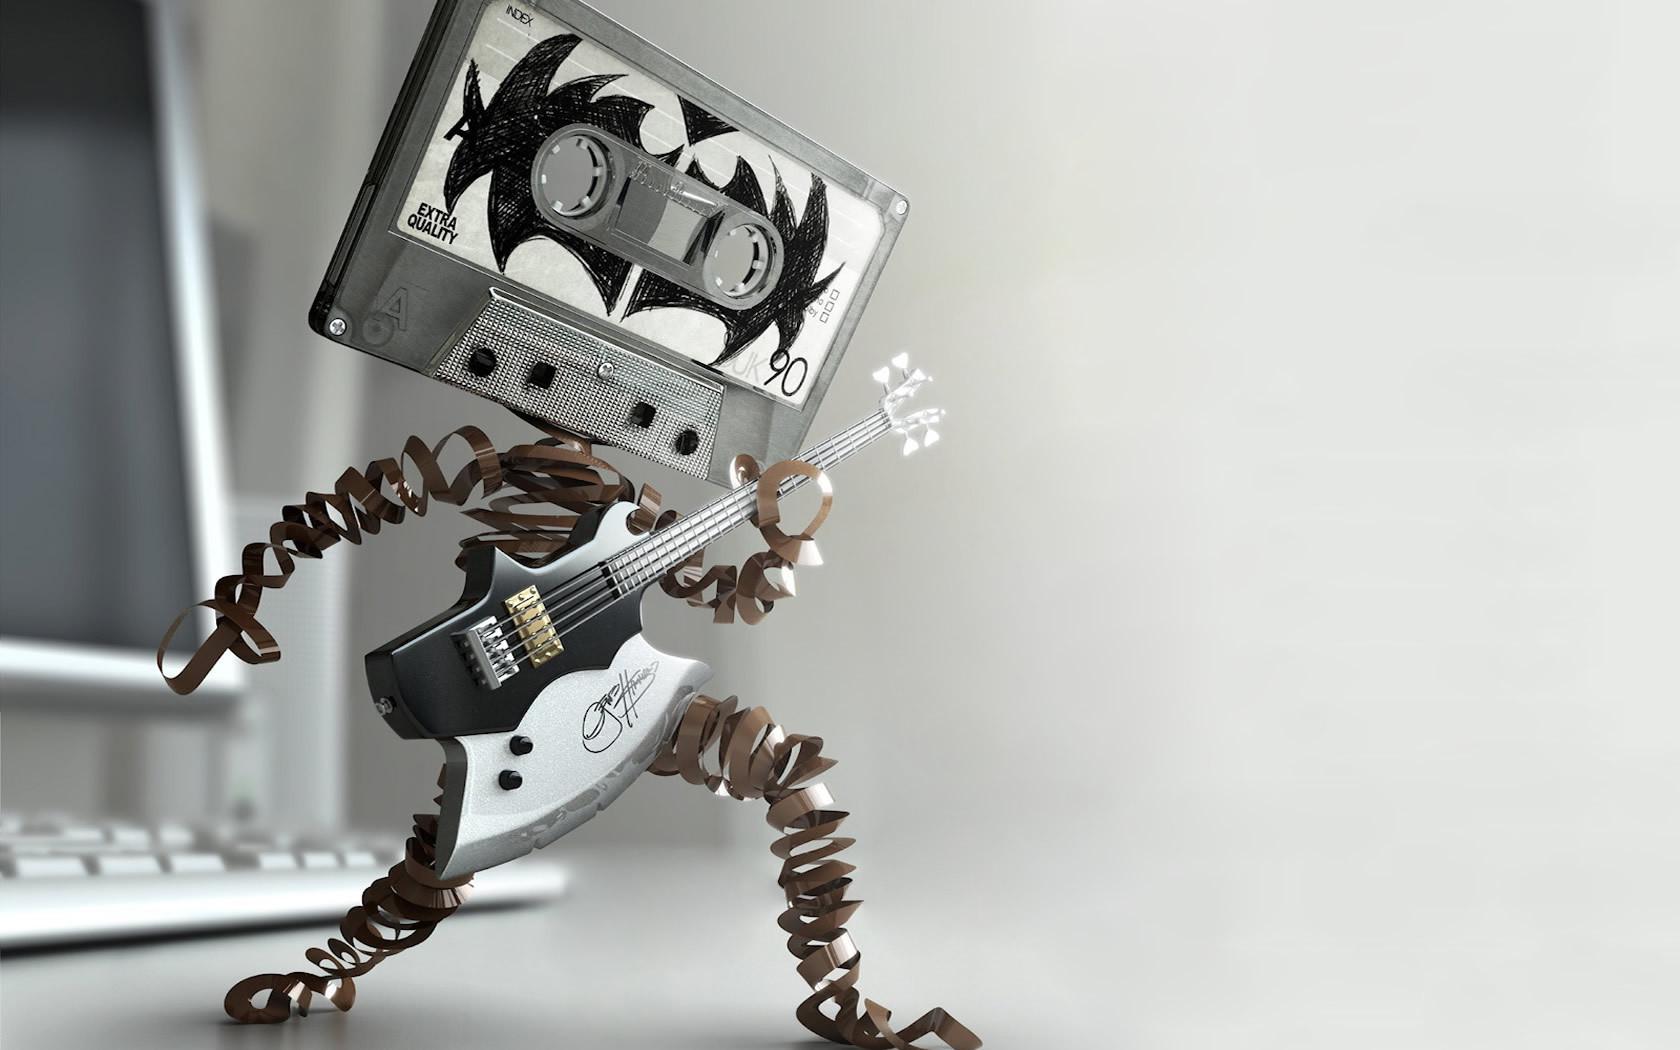 Music images Cassette Rock wallpaper photos 17588600 1680x1050